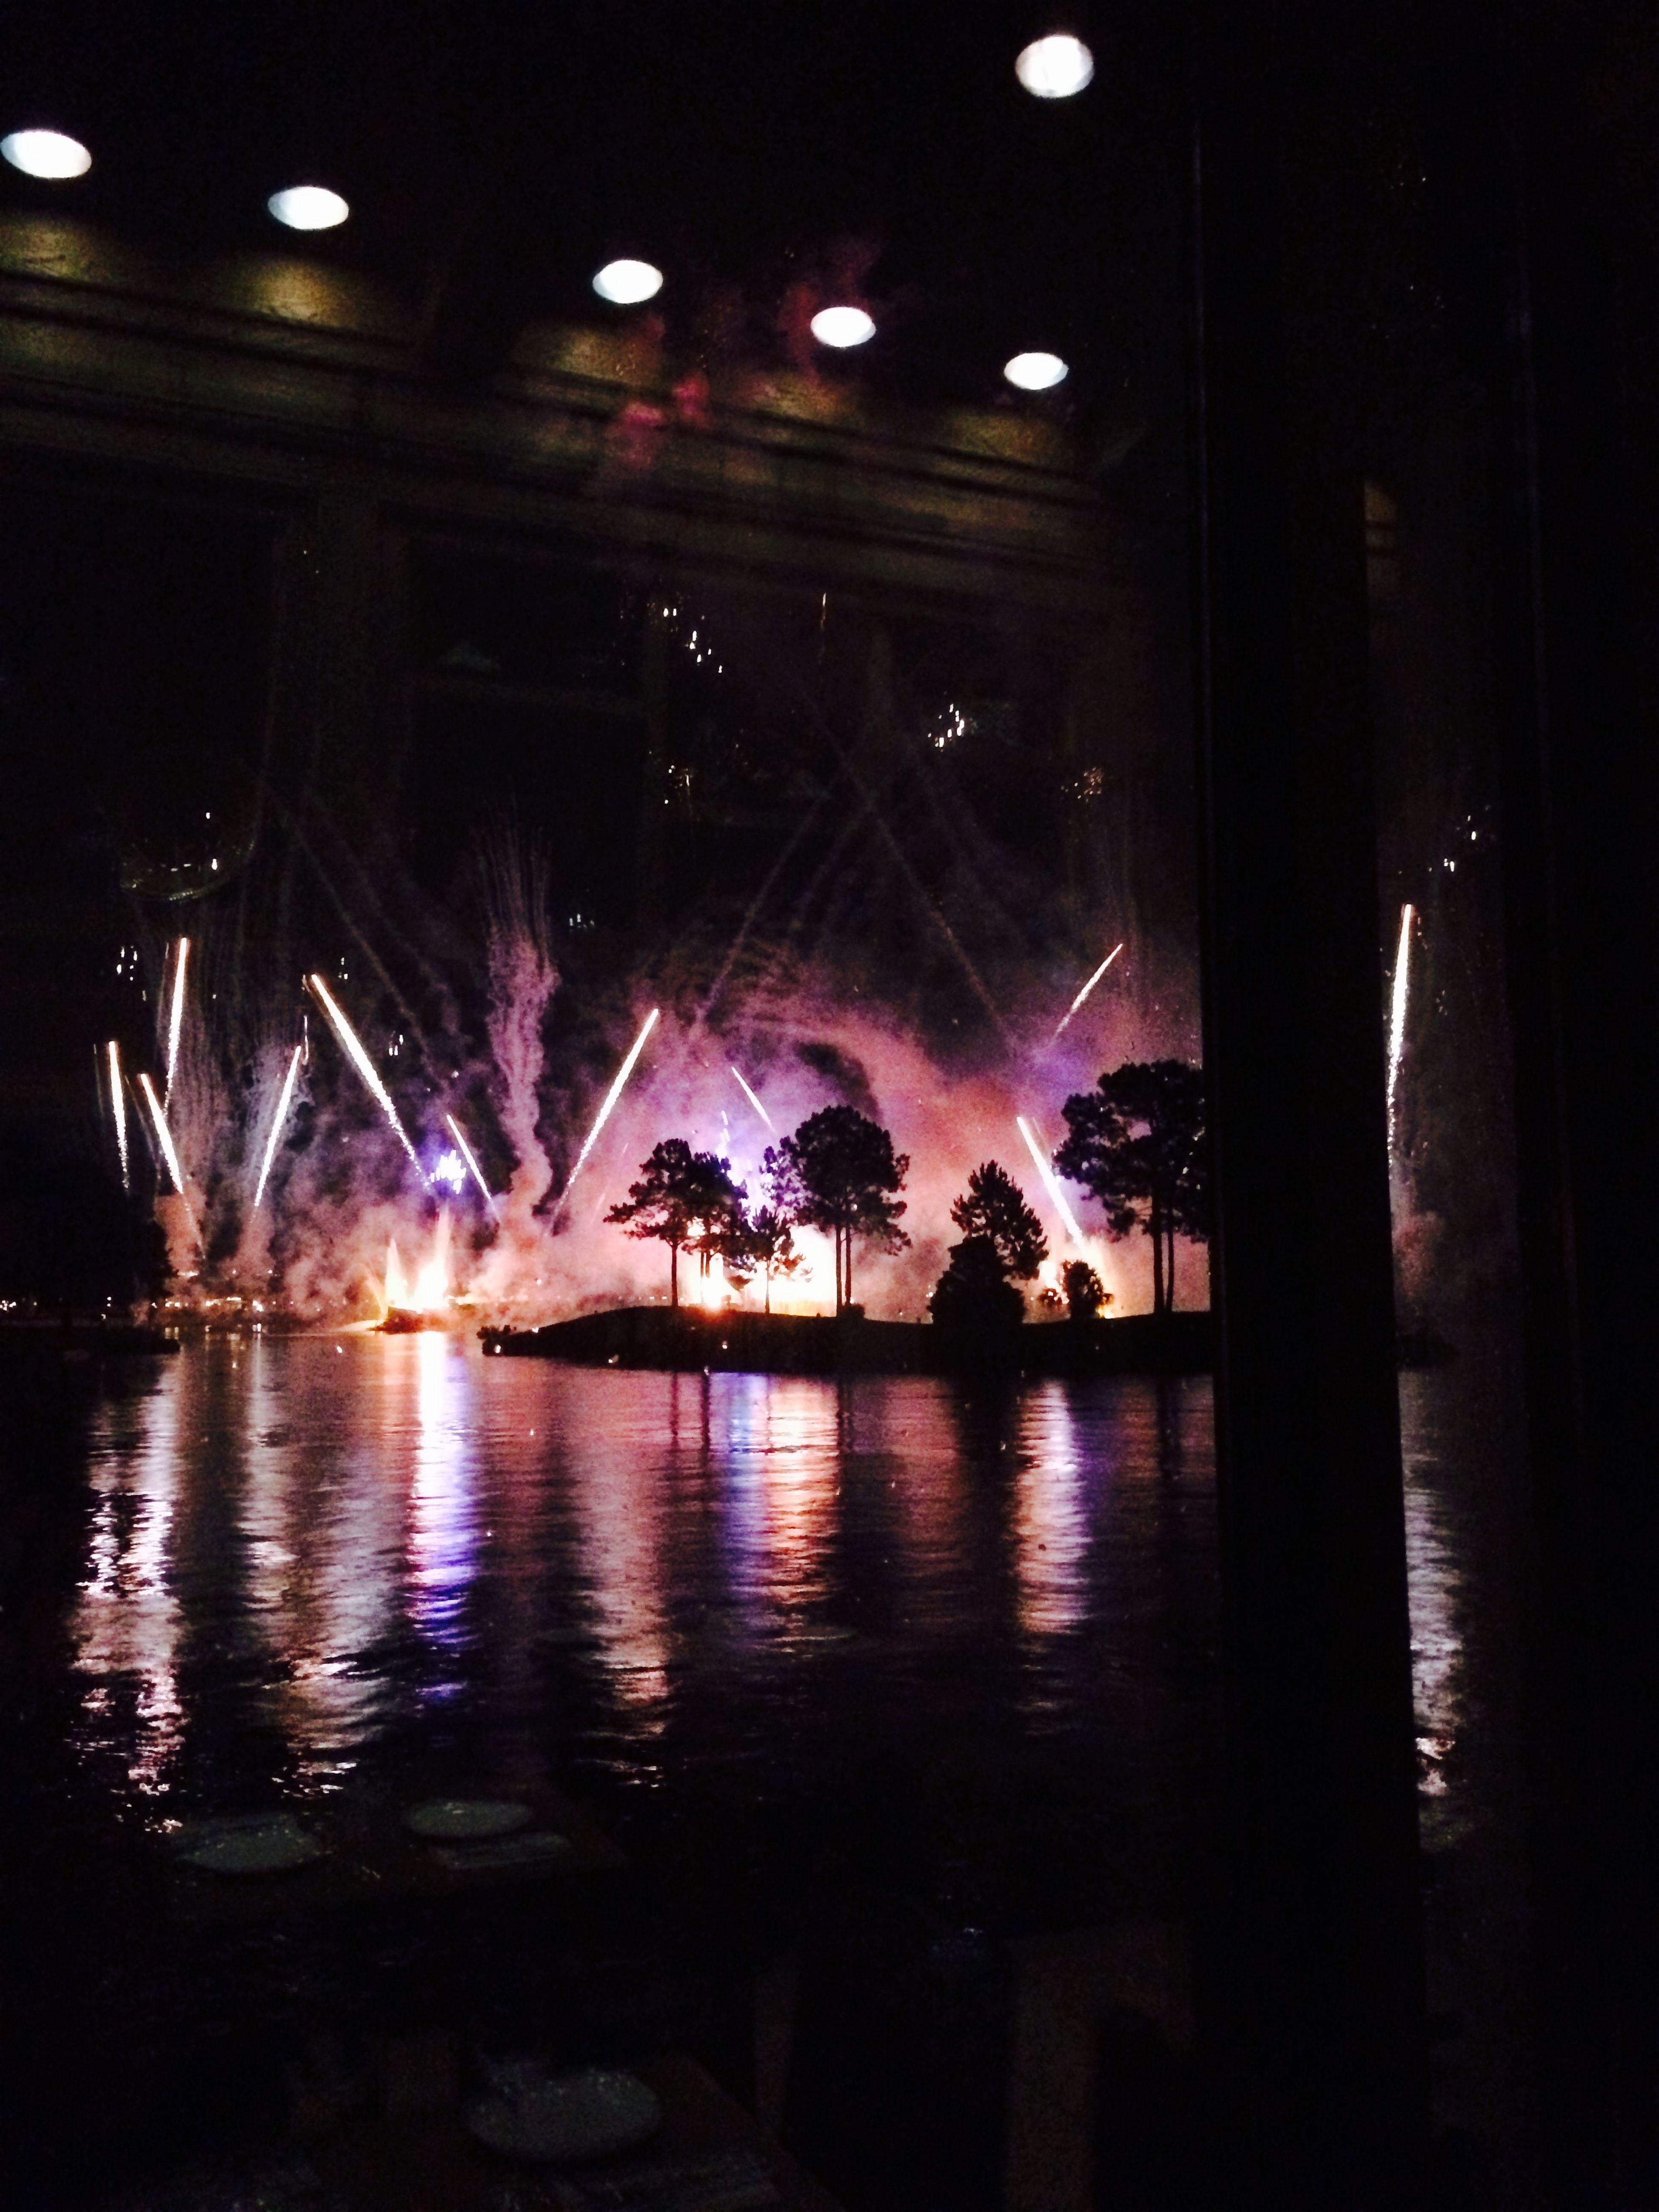 Fireworks Epcot Spiceroadtable Walt Disney World Mrocco Pavilion 9 O'clock